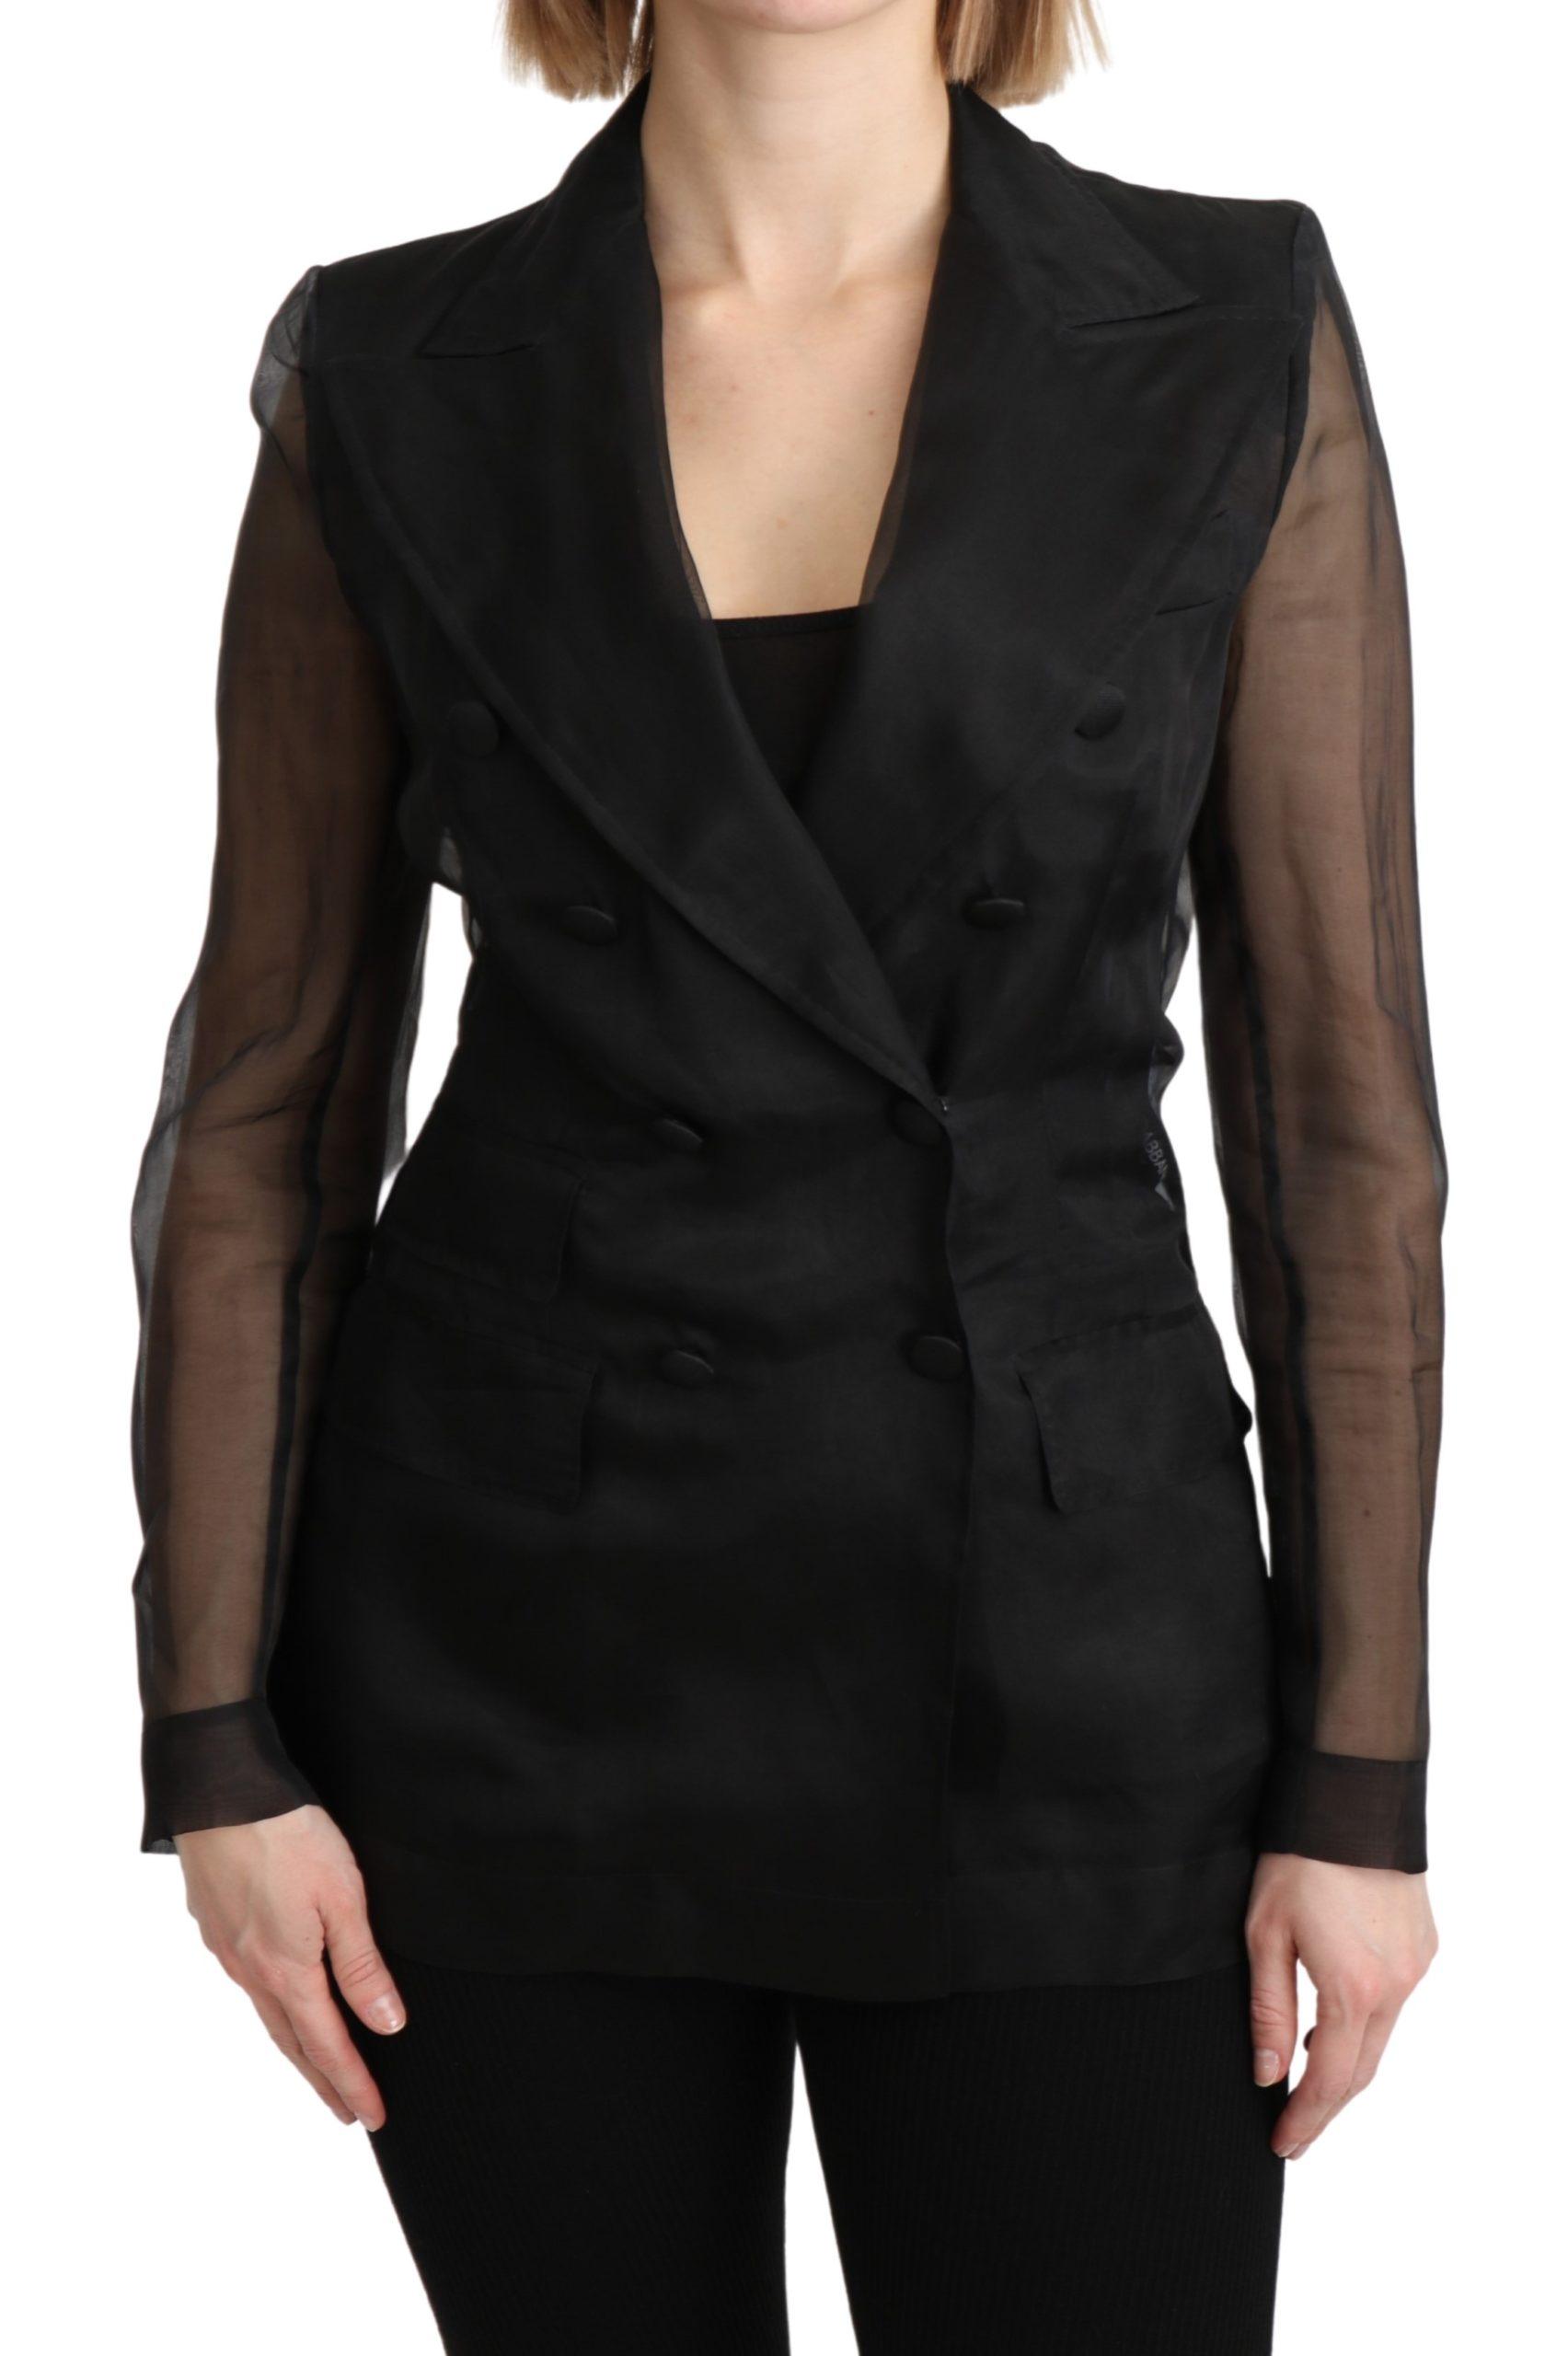 Dolce & Gabbana Women's Double Breasted Blazer Black KOS1797 - IT38 XS